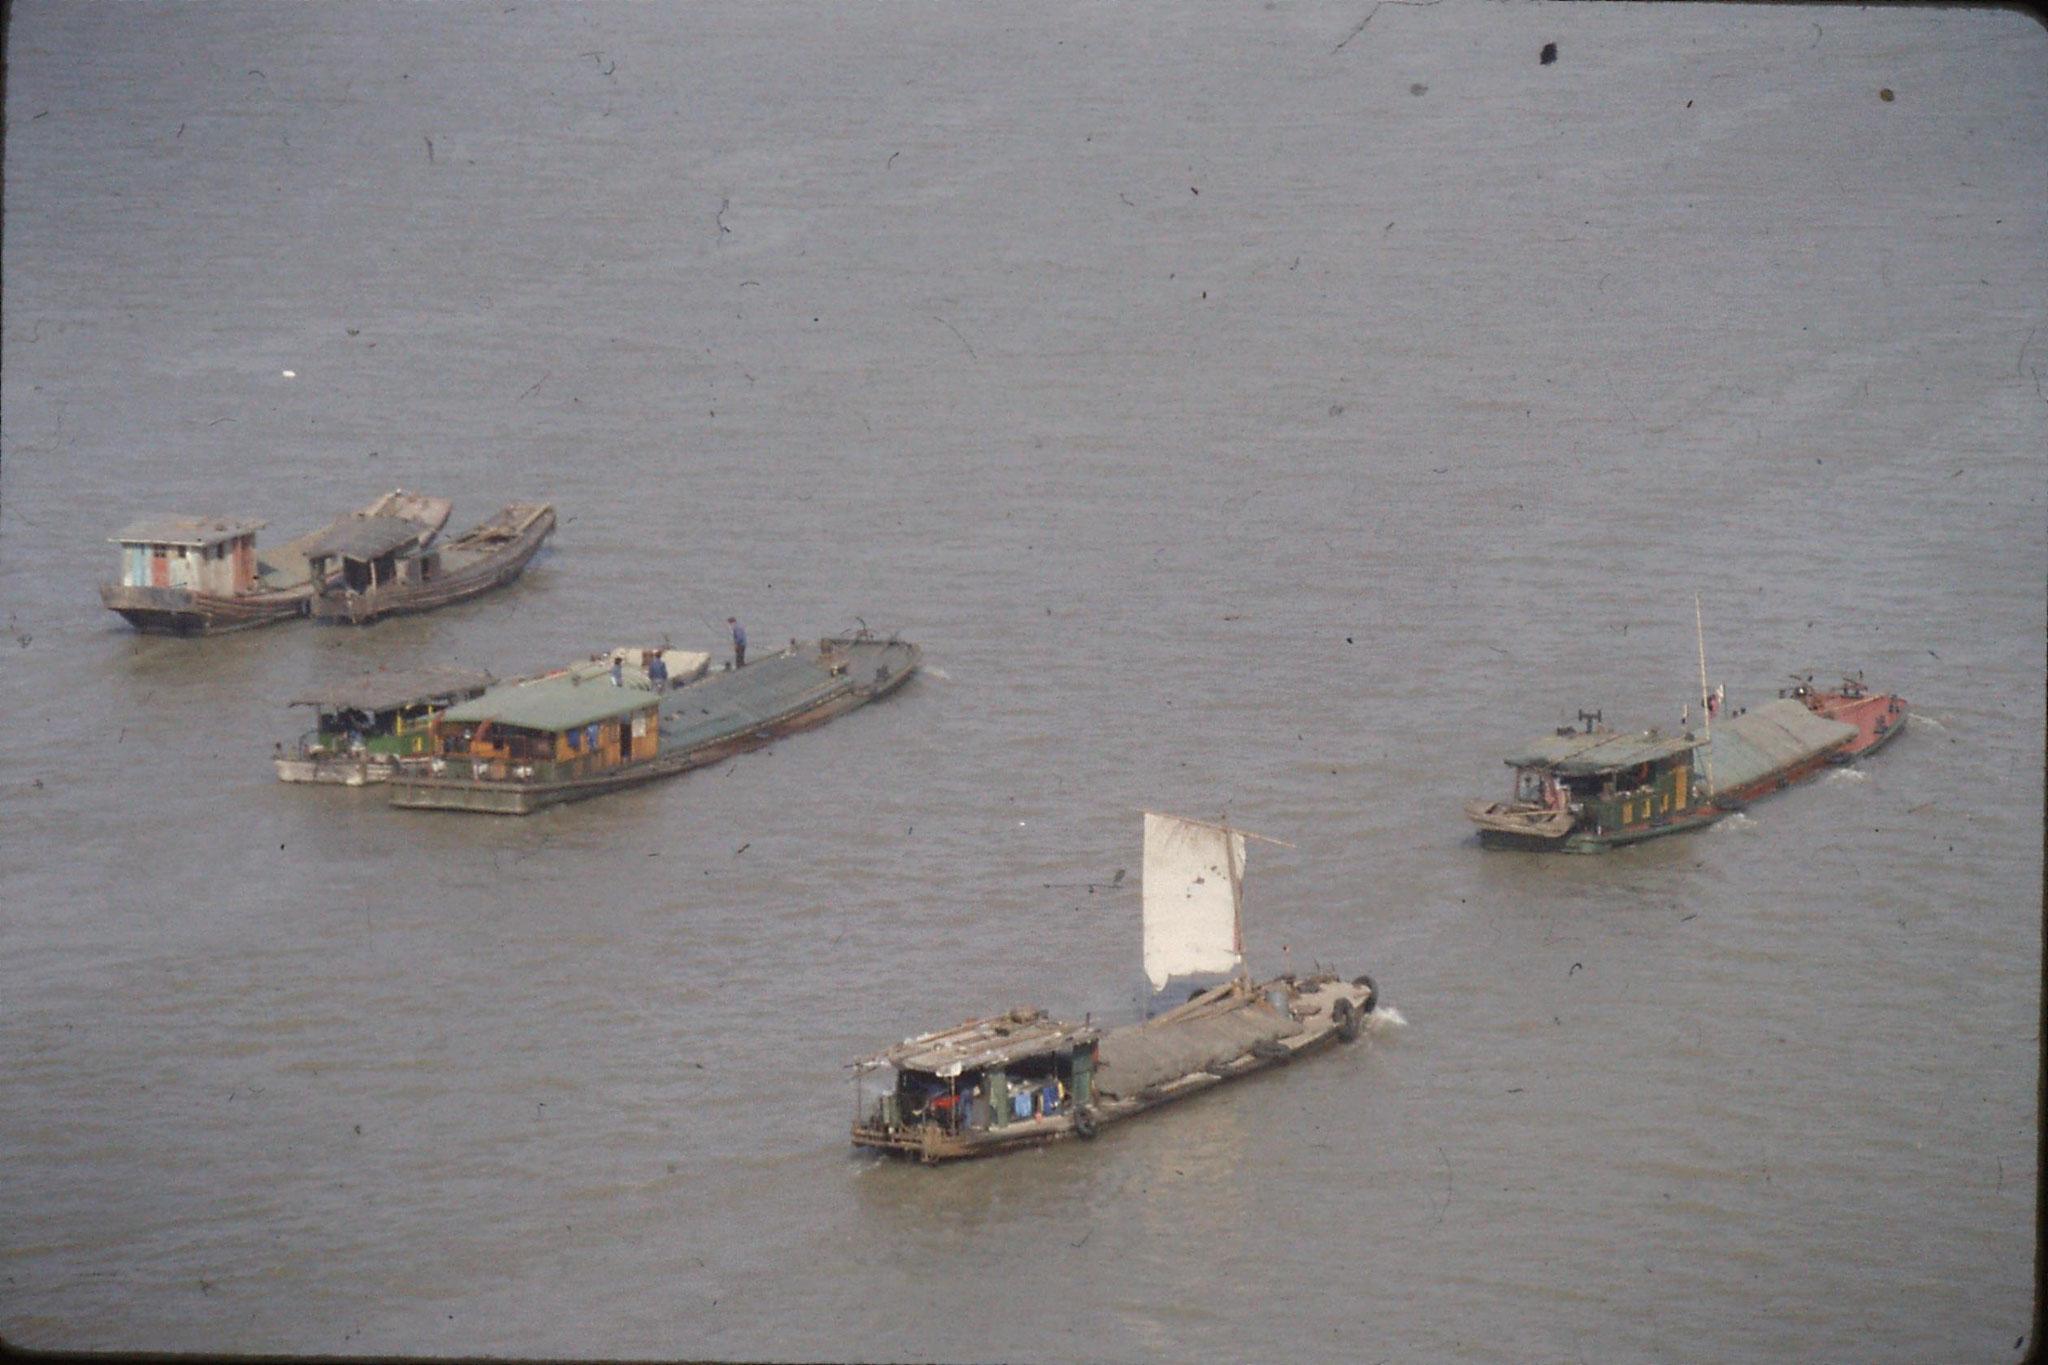 12/12/1988: 36: Nanjing Yangtse